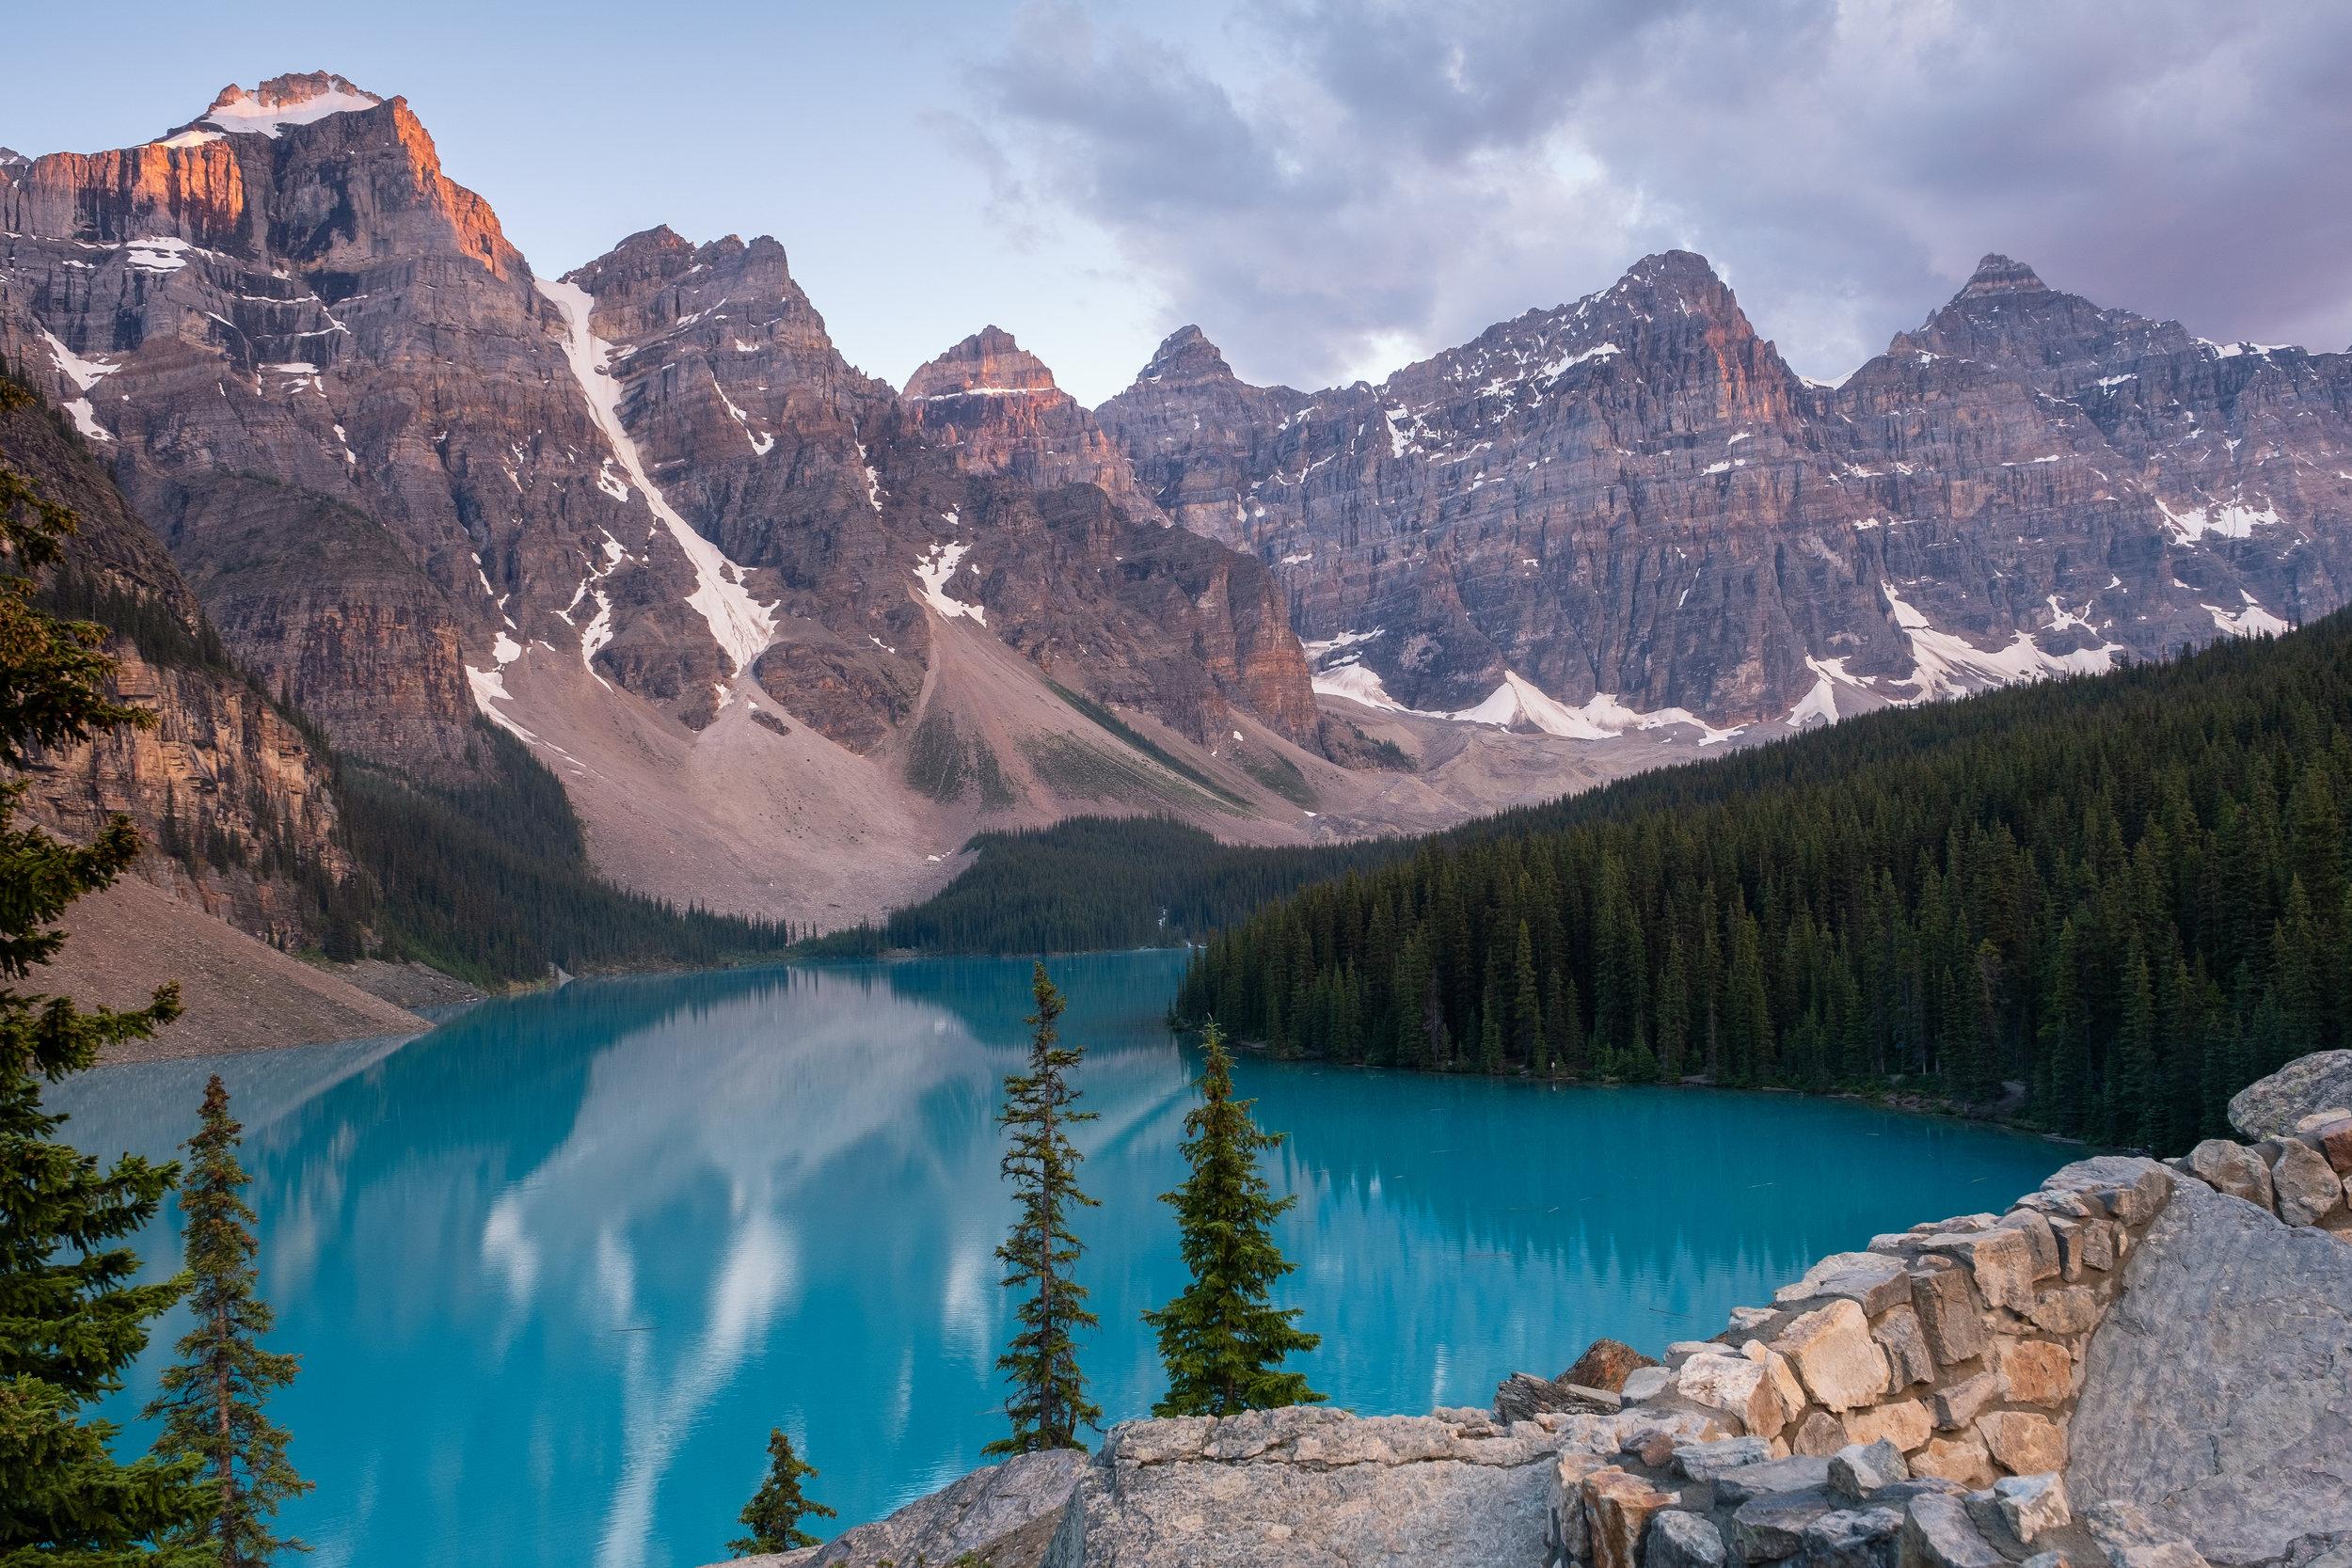 Morraine Lake in Banff National Park - Alberta, Canada. July, 2018.